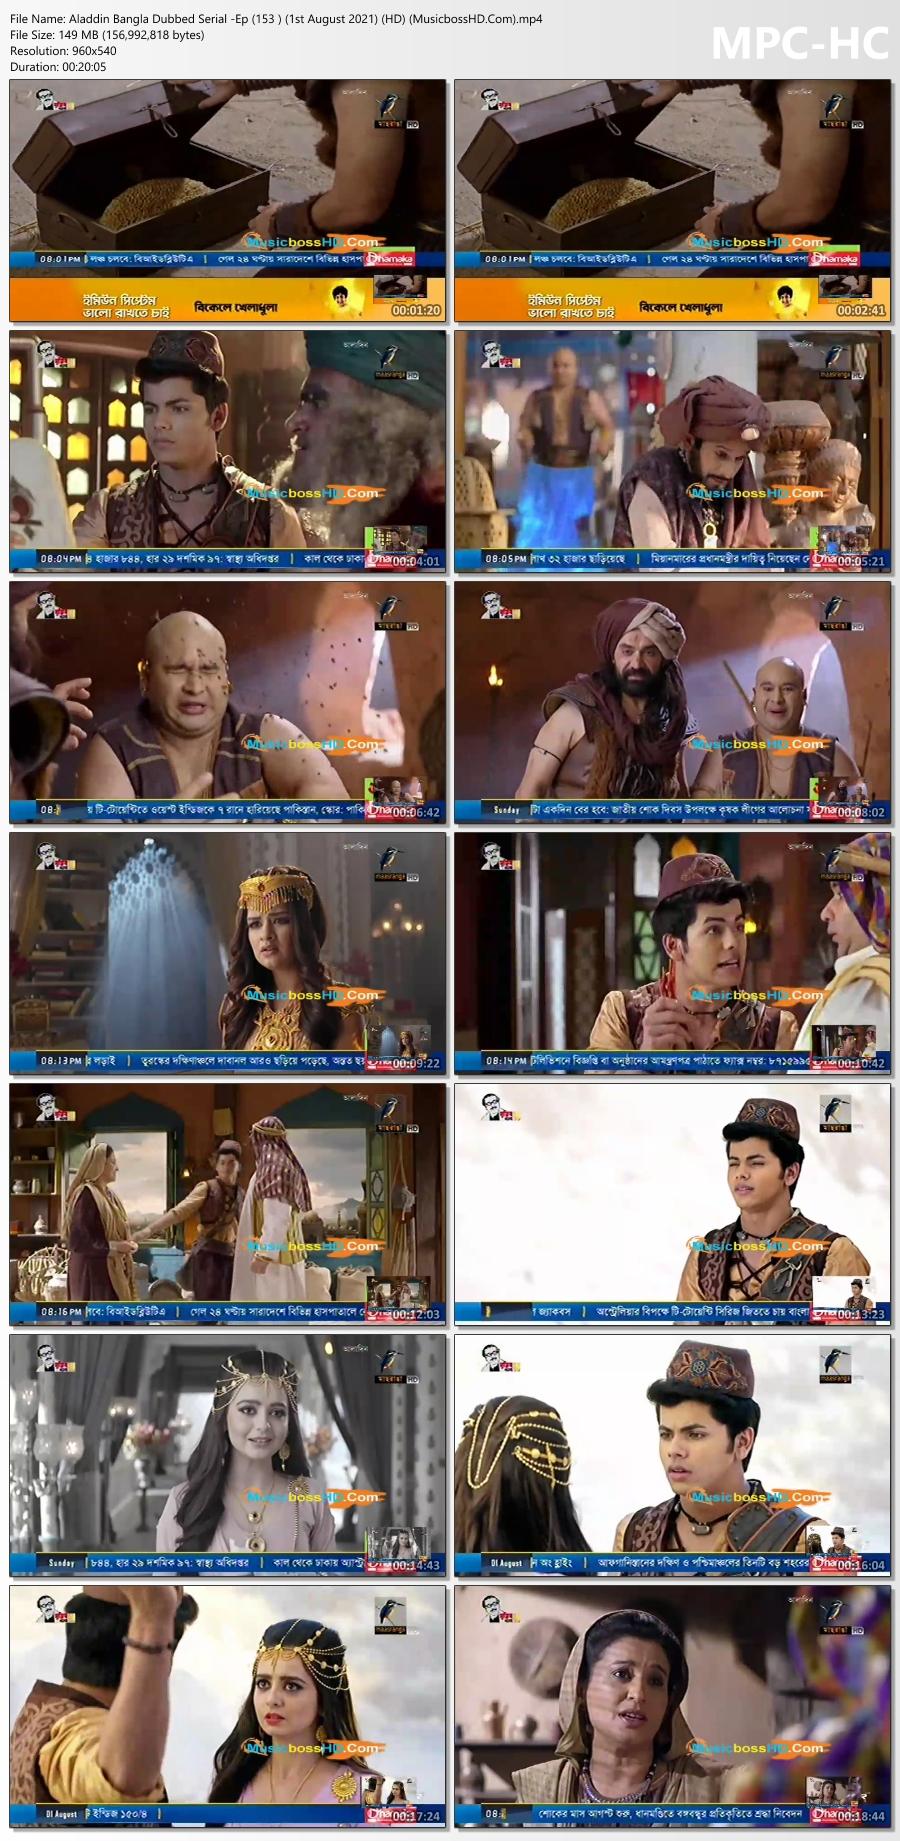 Aladdin-Bangla-Dubbed-Serial-Ep-153-1st-August-2021-HD-Musicboss-HD-Com-mp4-thumbs